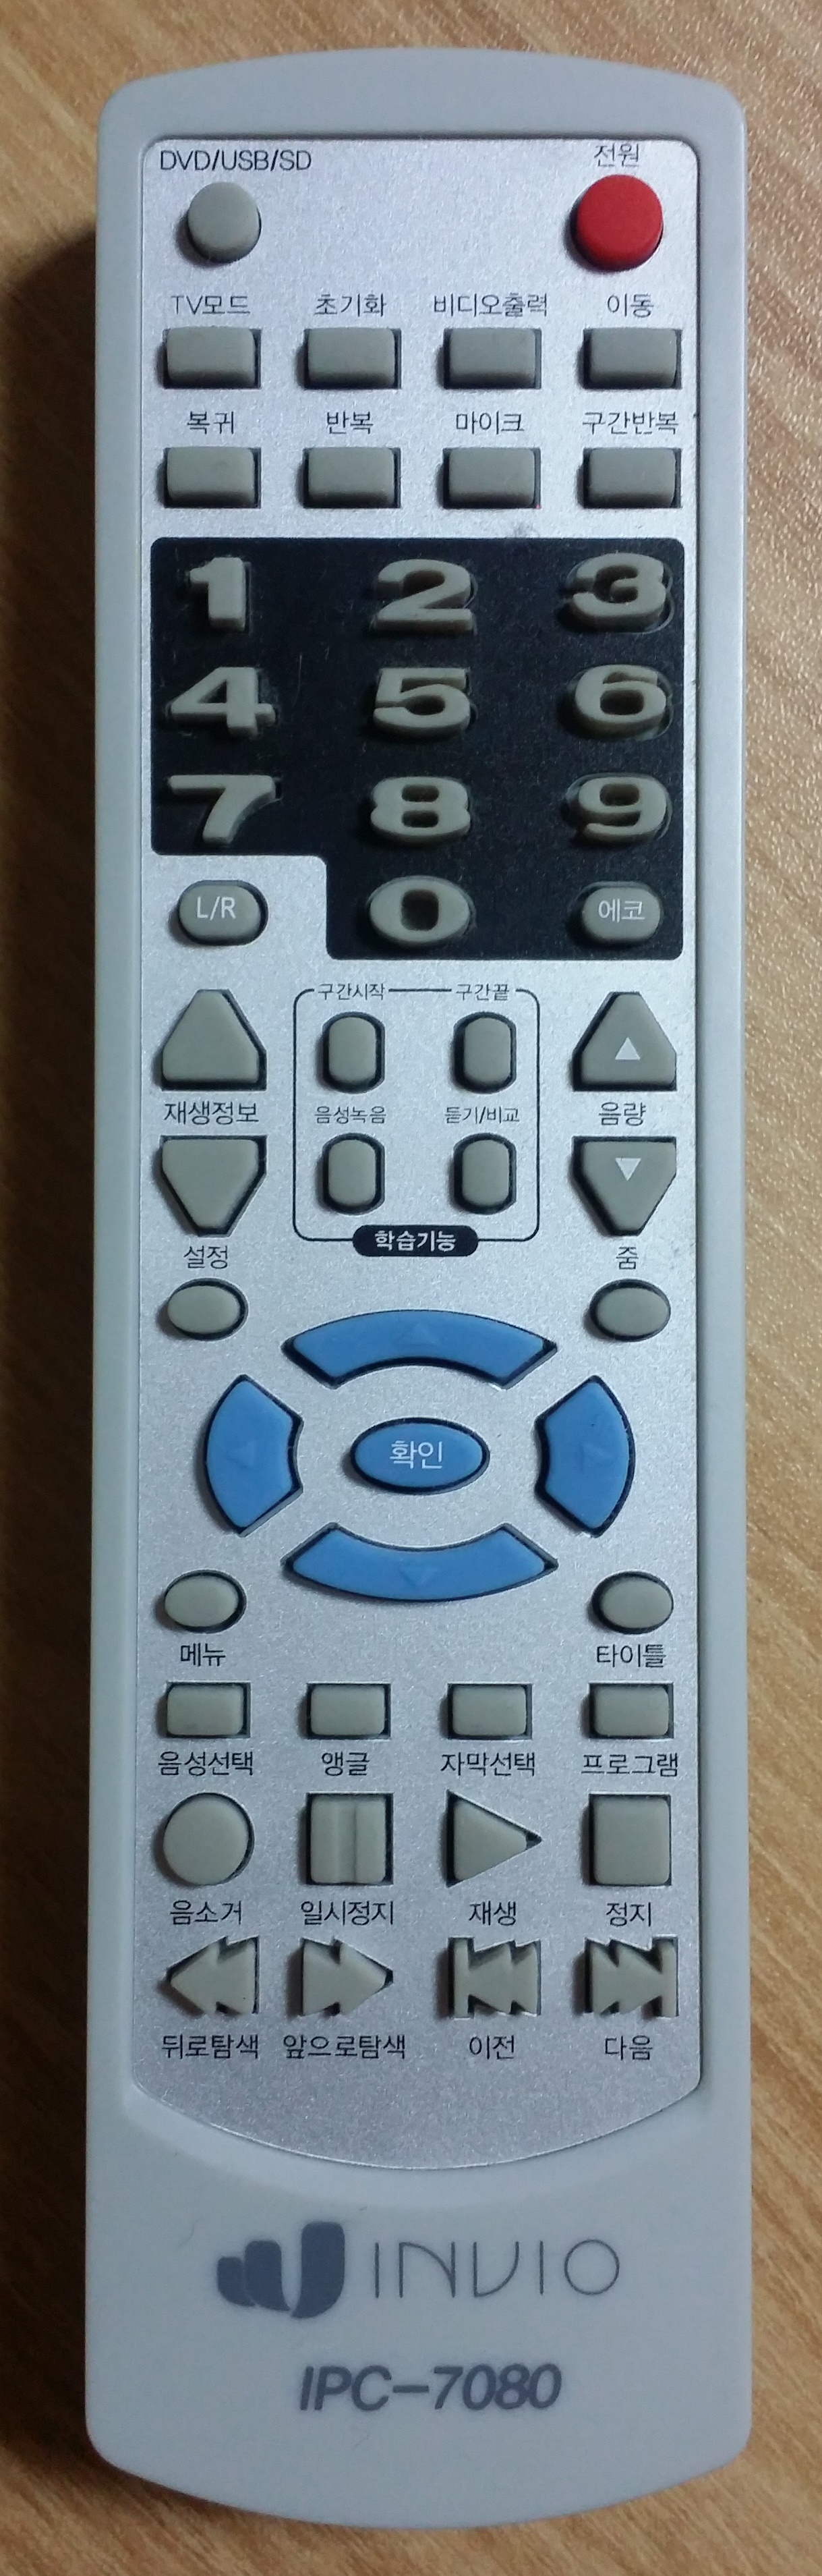 IPC-7080리모콘.jpg